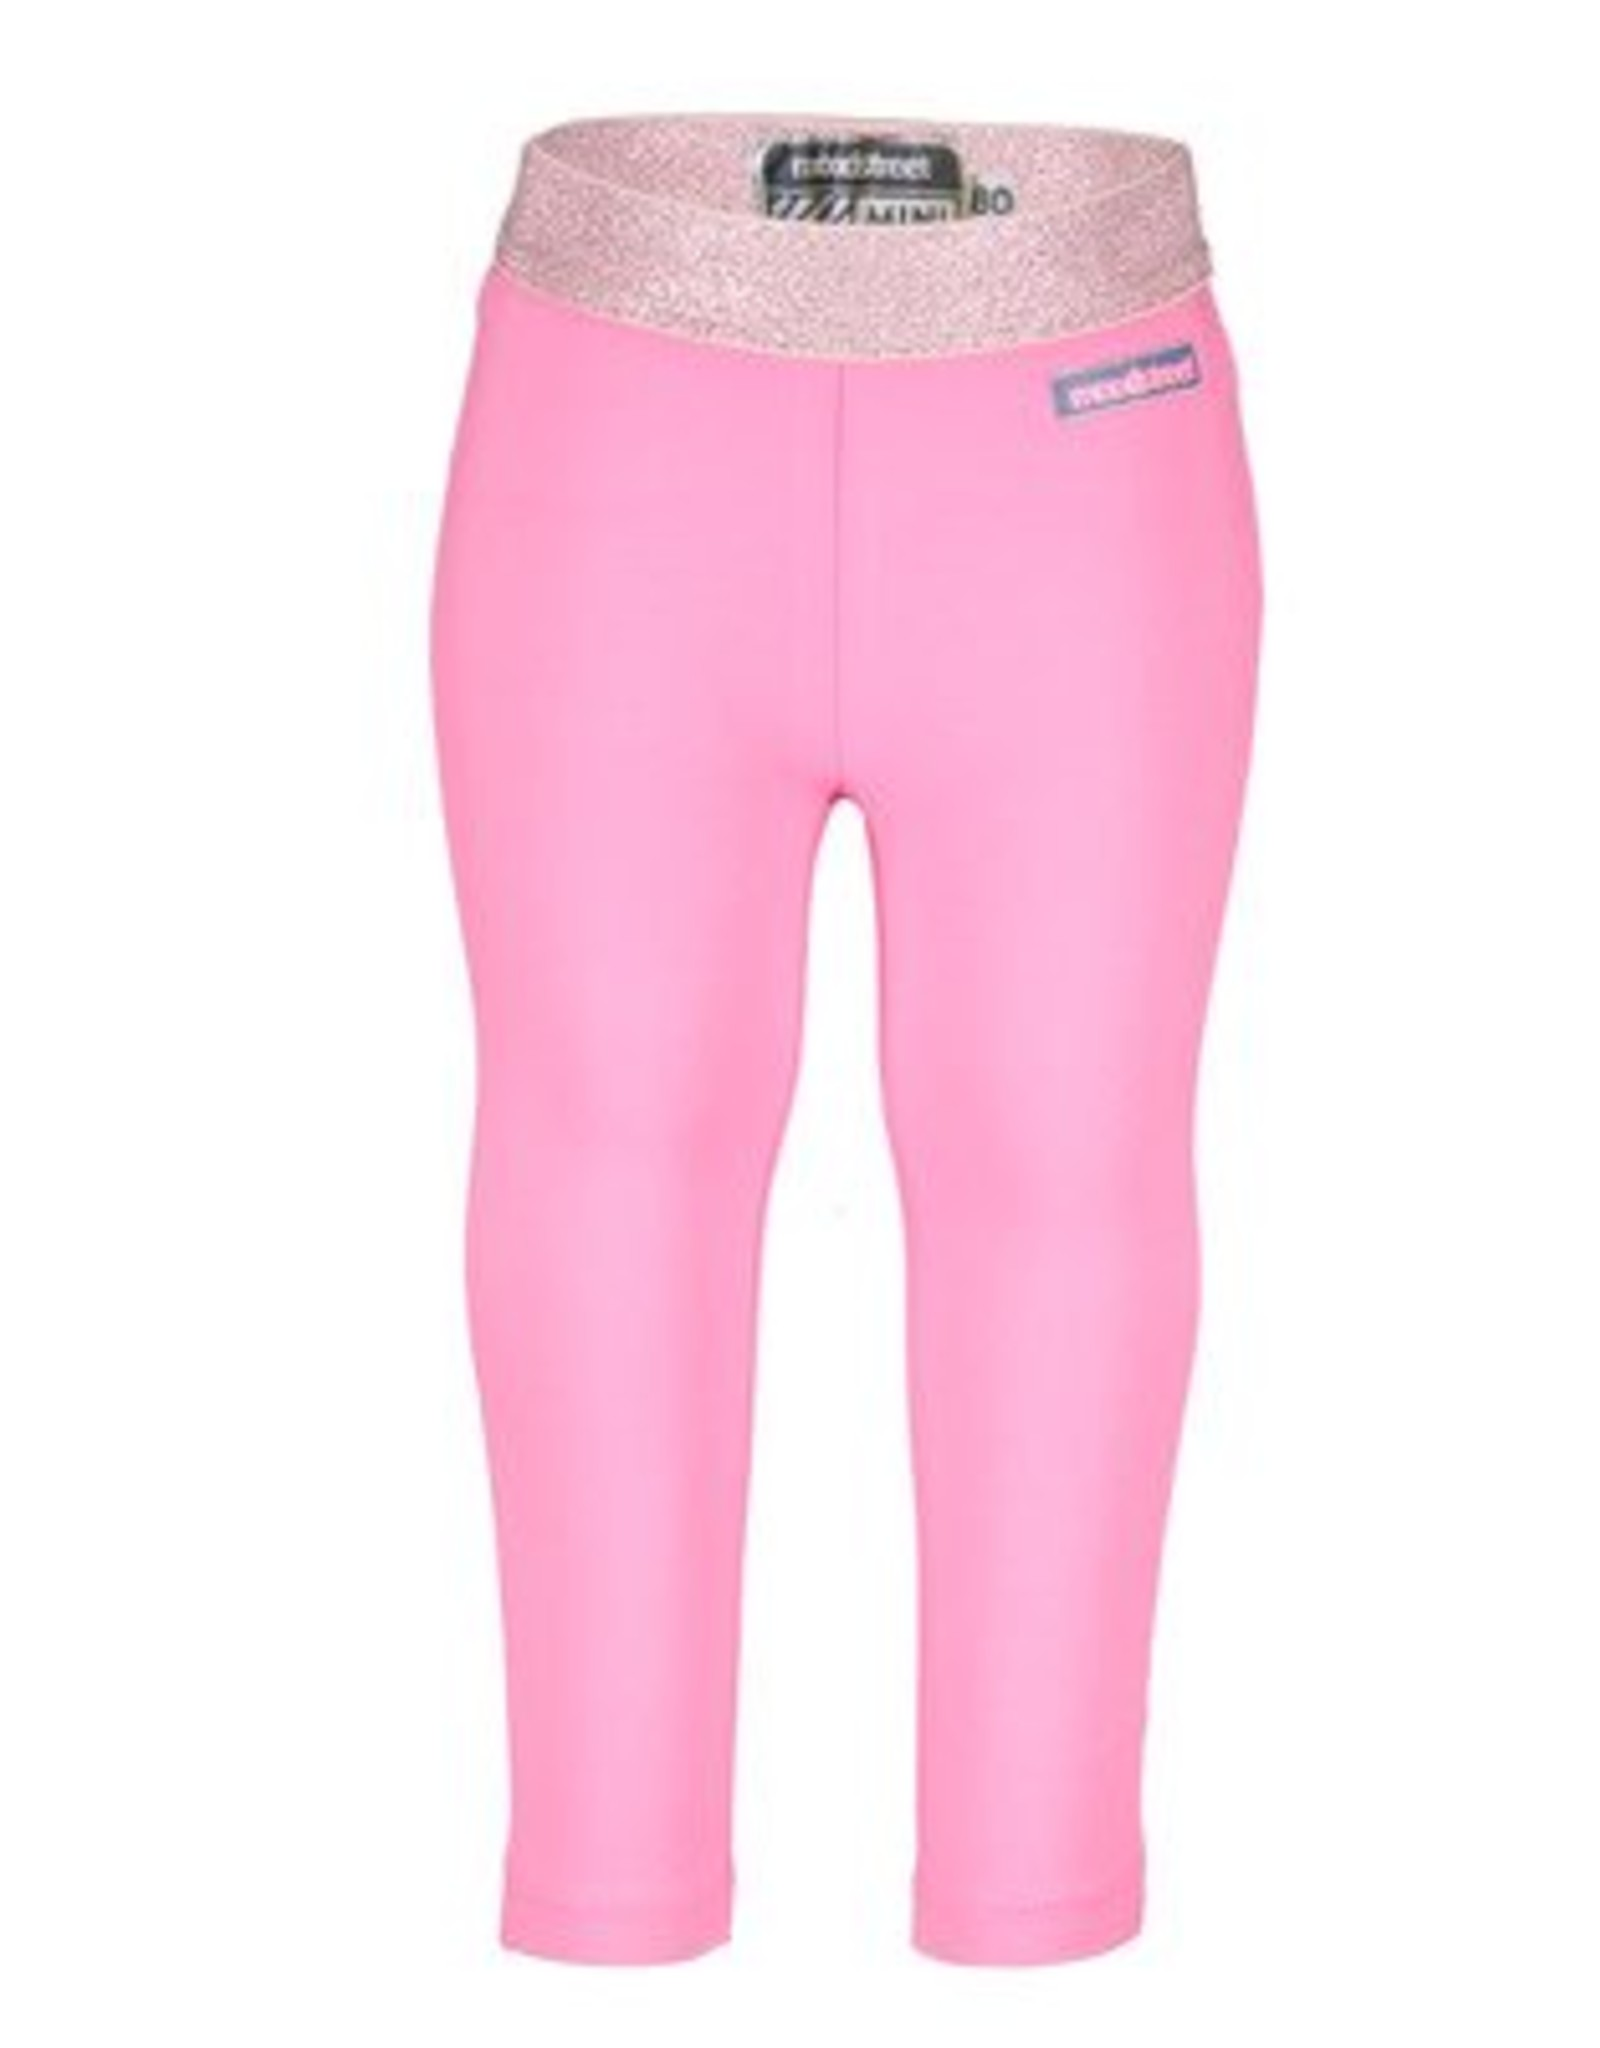 Moodstreet Legging solid 241 pink